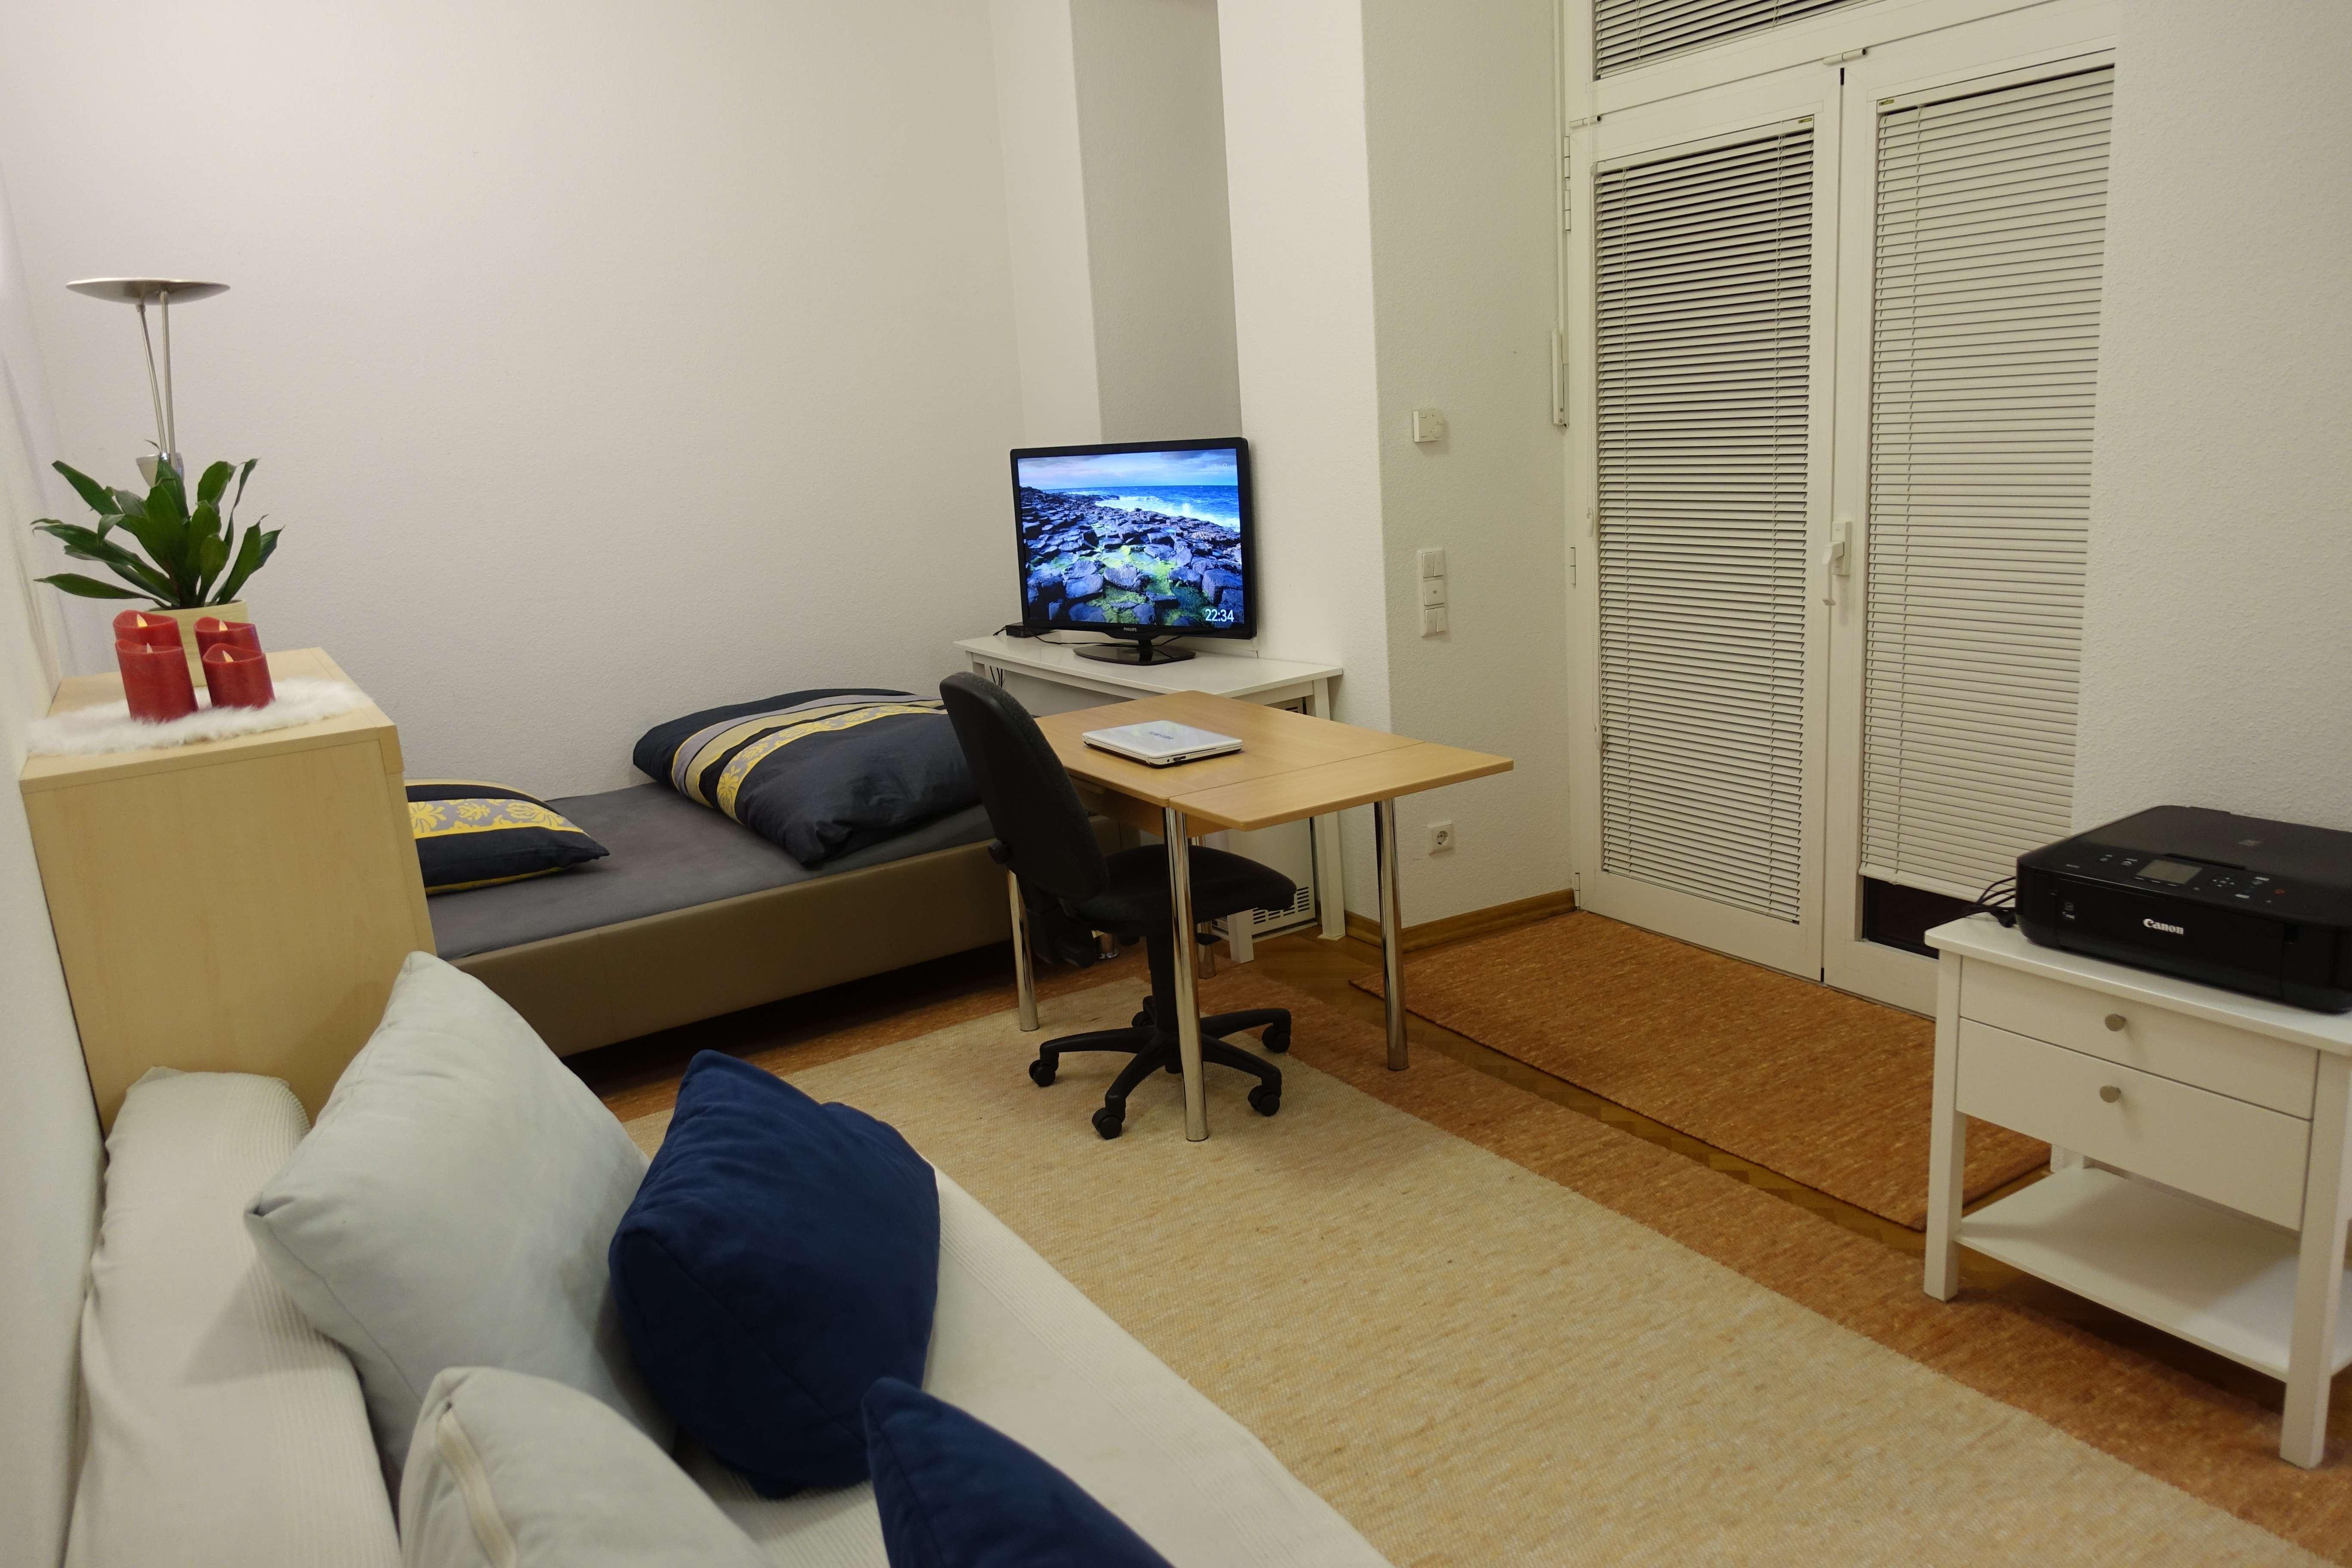 Luxus City-Apartment in München, Ludwigsvorstadt-Isarvorstadt in Ludwigsvorstadt-Isarvorstadt (München)